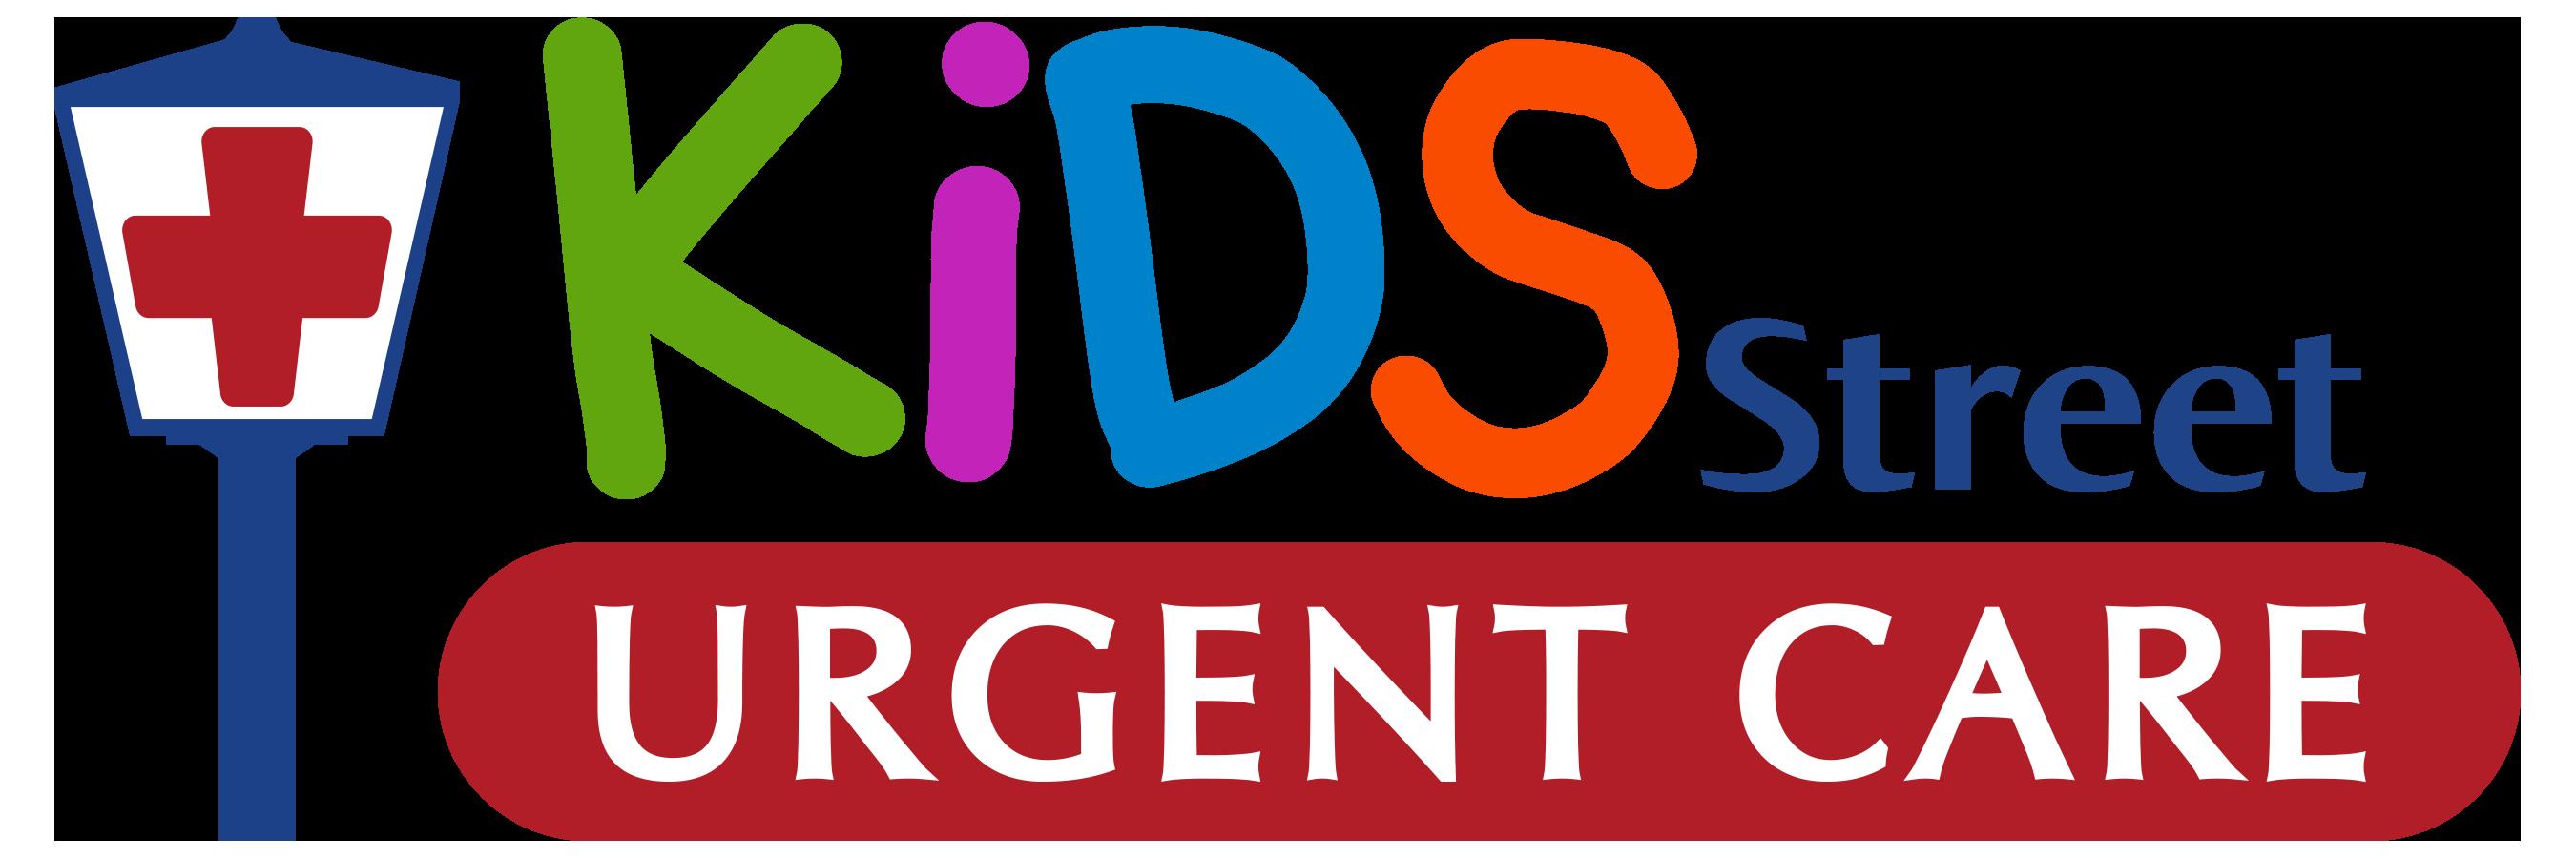 Kidsstreet Urgent Care Pediatric Urgent Care Open Late 7 Days A Week